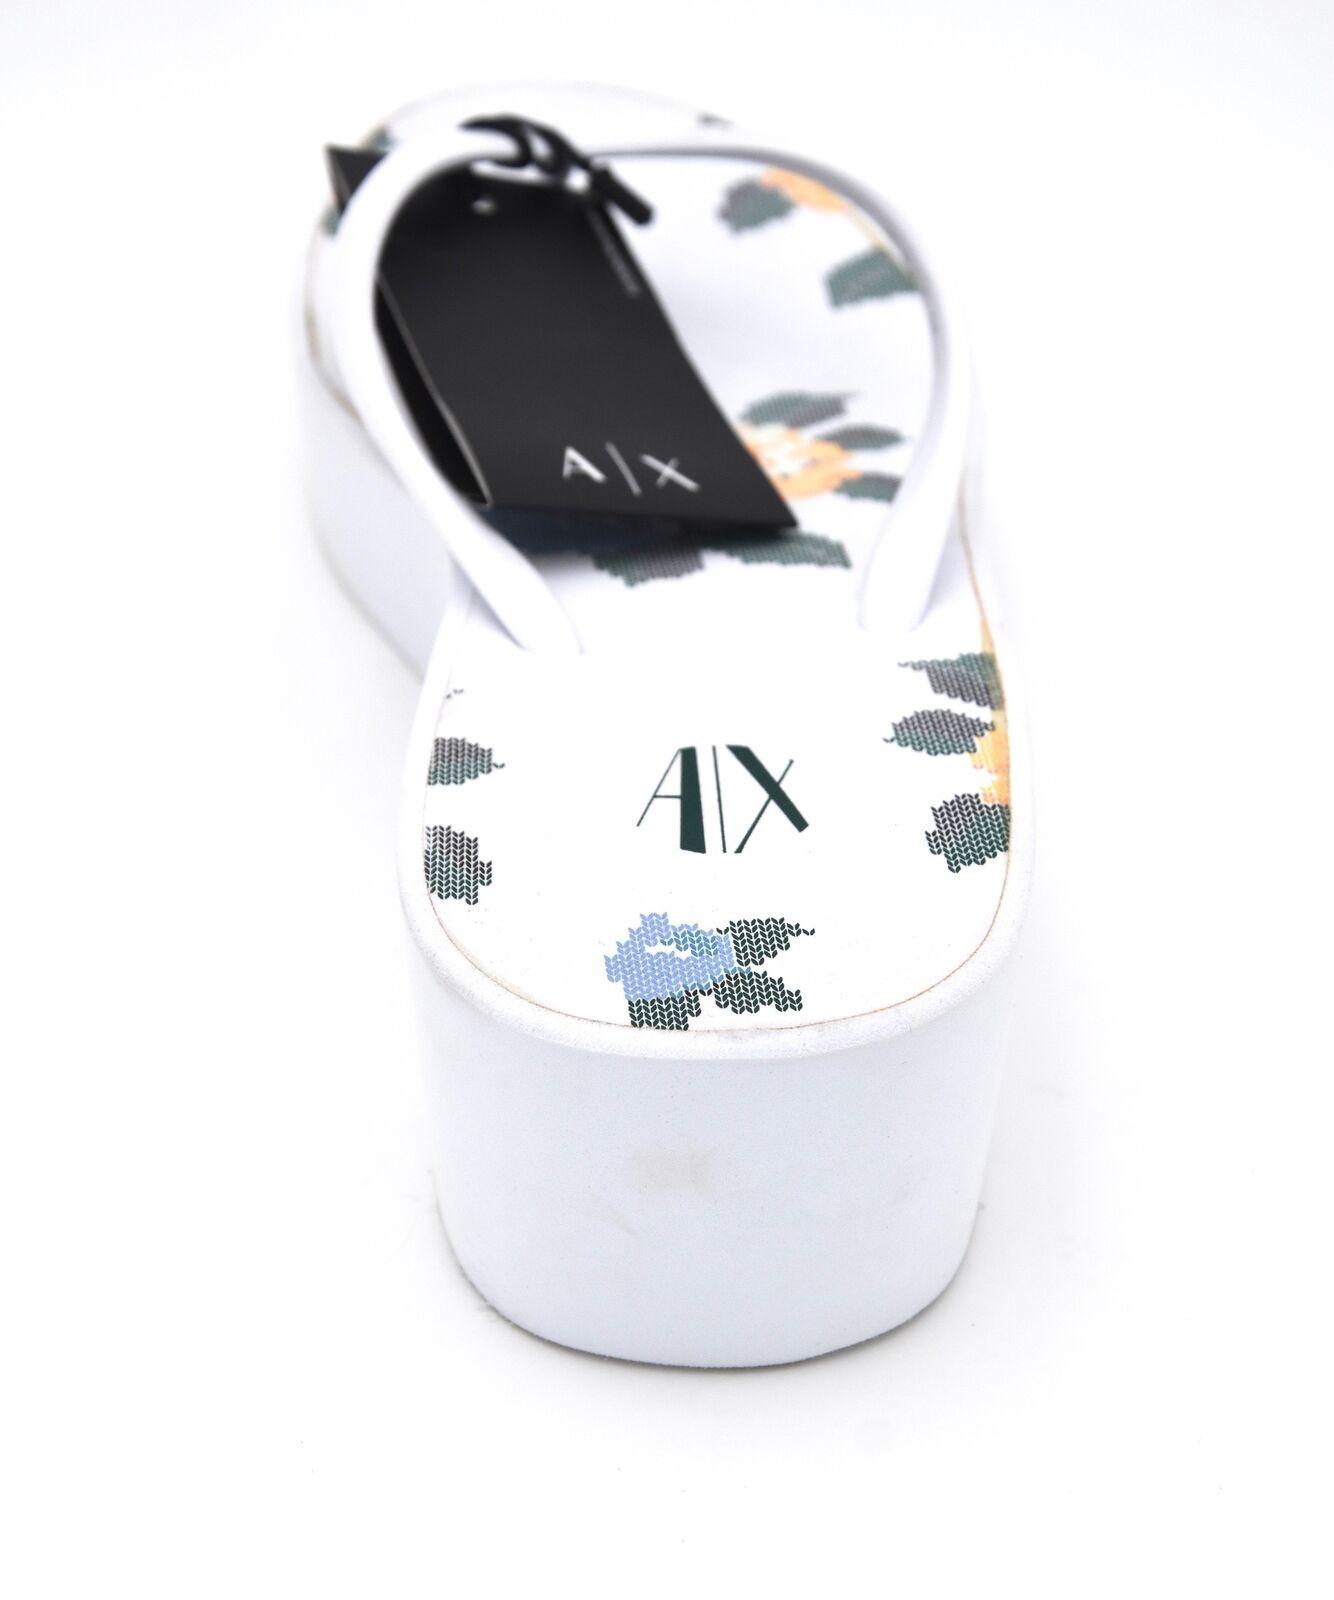 ARMANI ARMANI ARMANI EXCHANGE Damenschuhe WEDGE FLIP FLOPS SANDALS Schuhe CODE 945057 8P492 DEFECT acf3e8